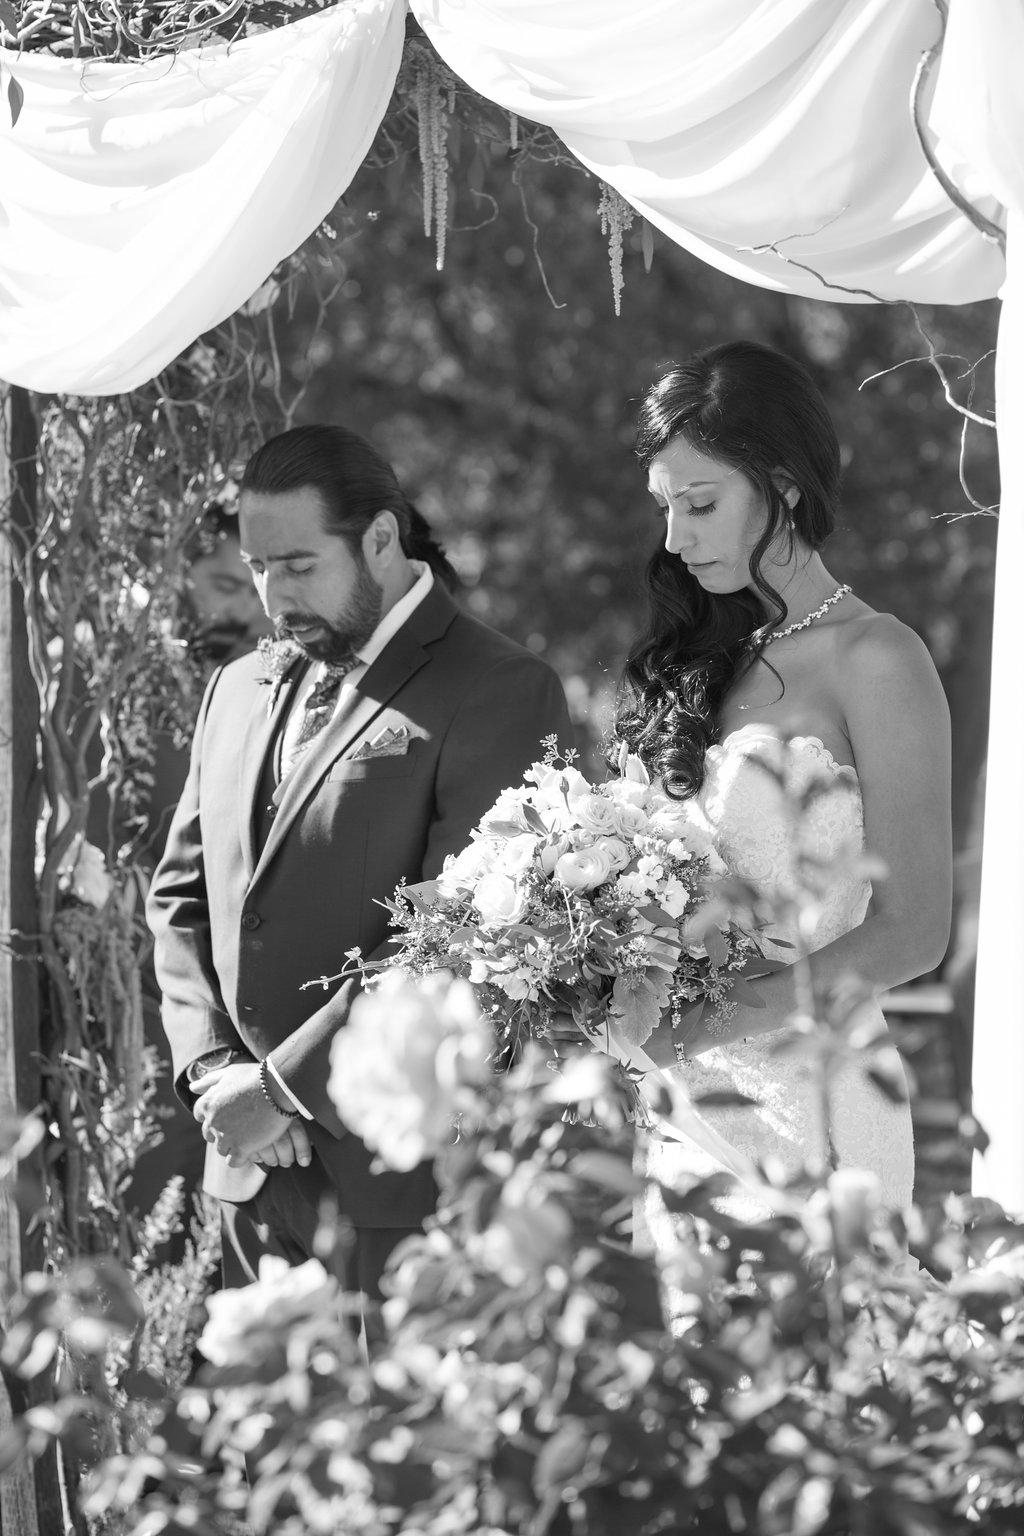 Cindy&KennethWedding_photo_AirykaRockefeller-222.jpg